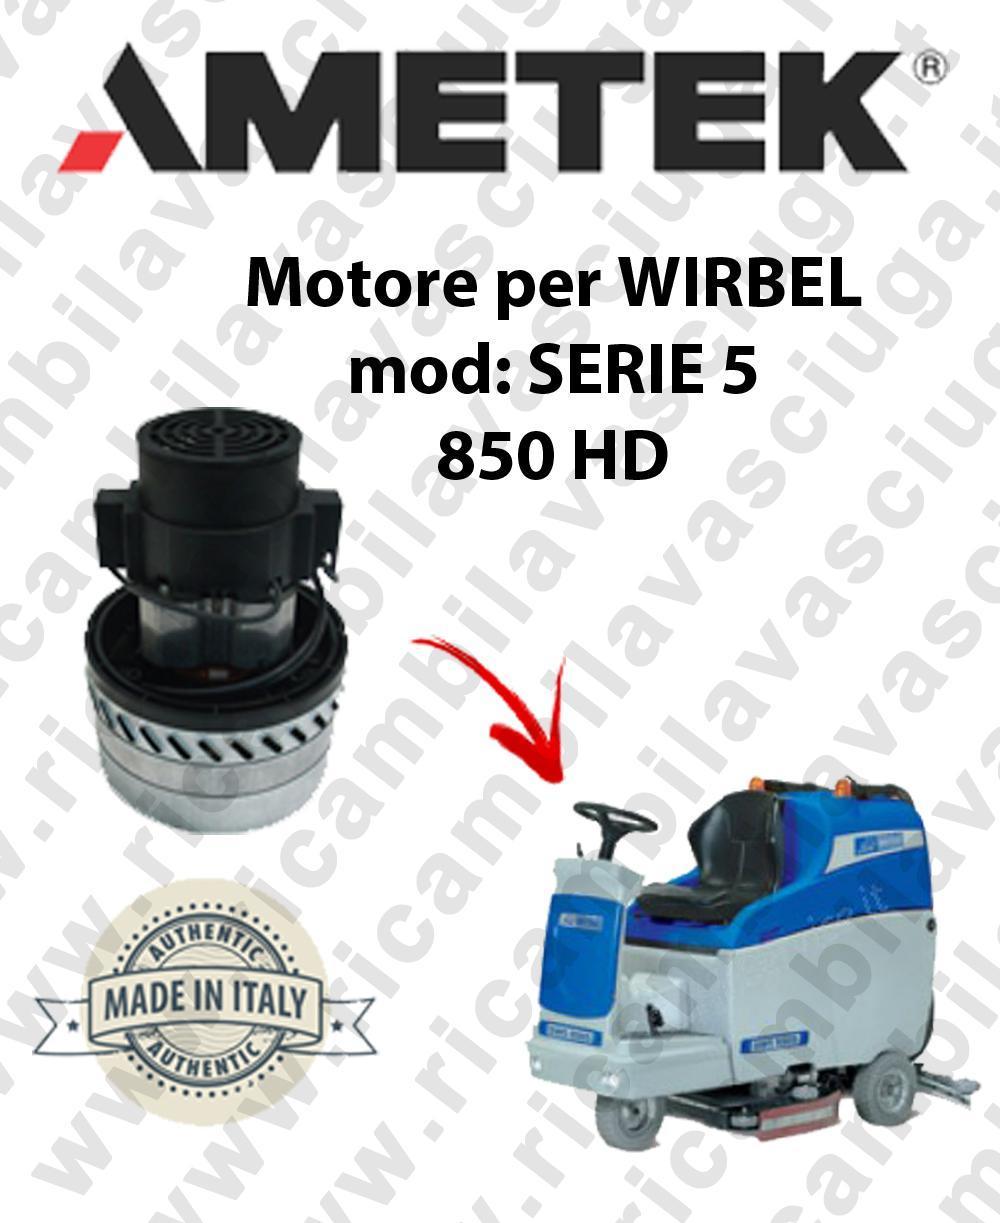 SERIE 5 850 HD Motore de aspiración AMETEK para fregadora WIRBEL